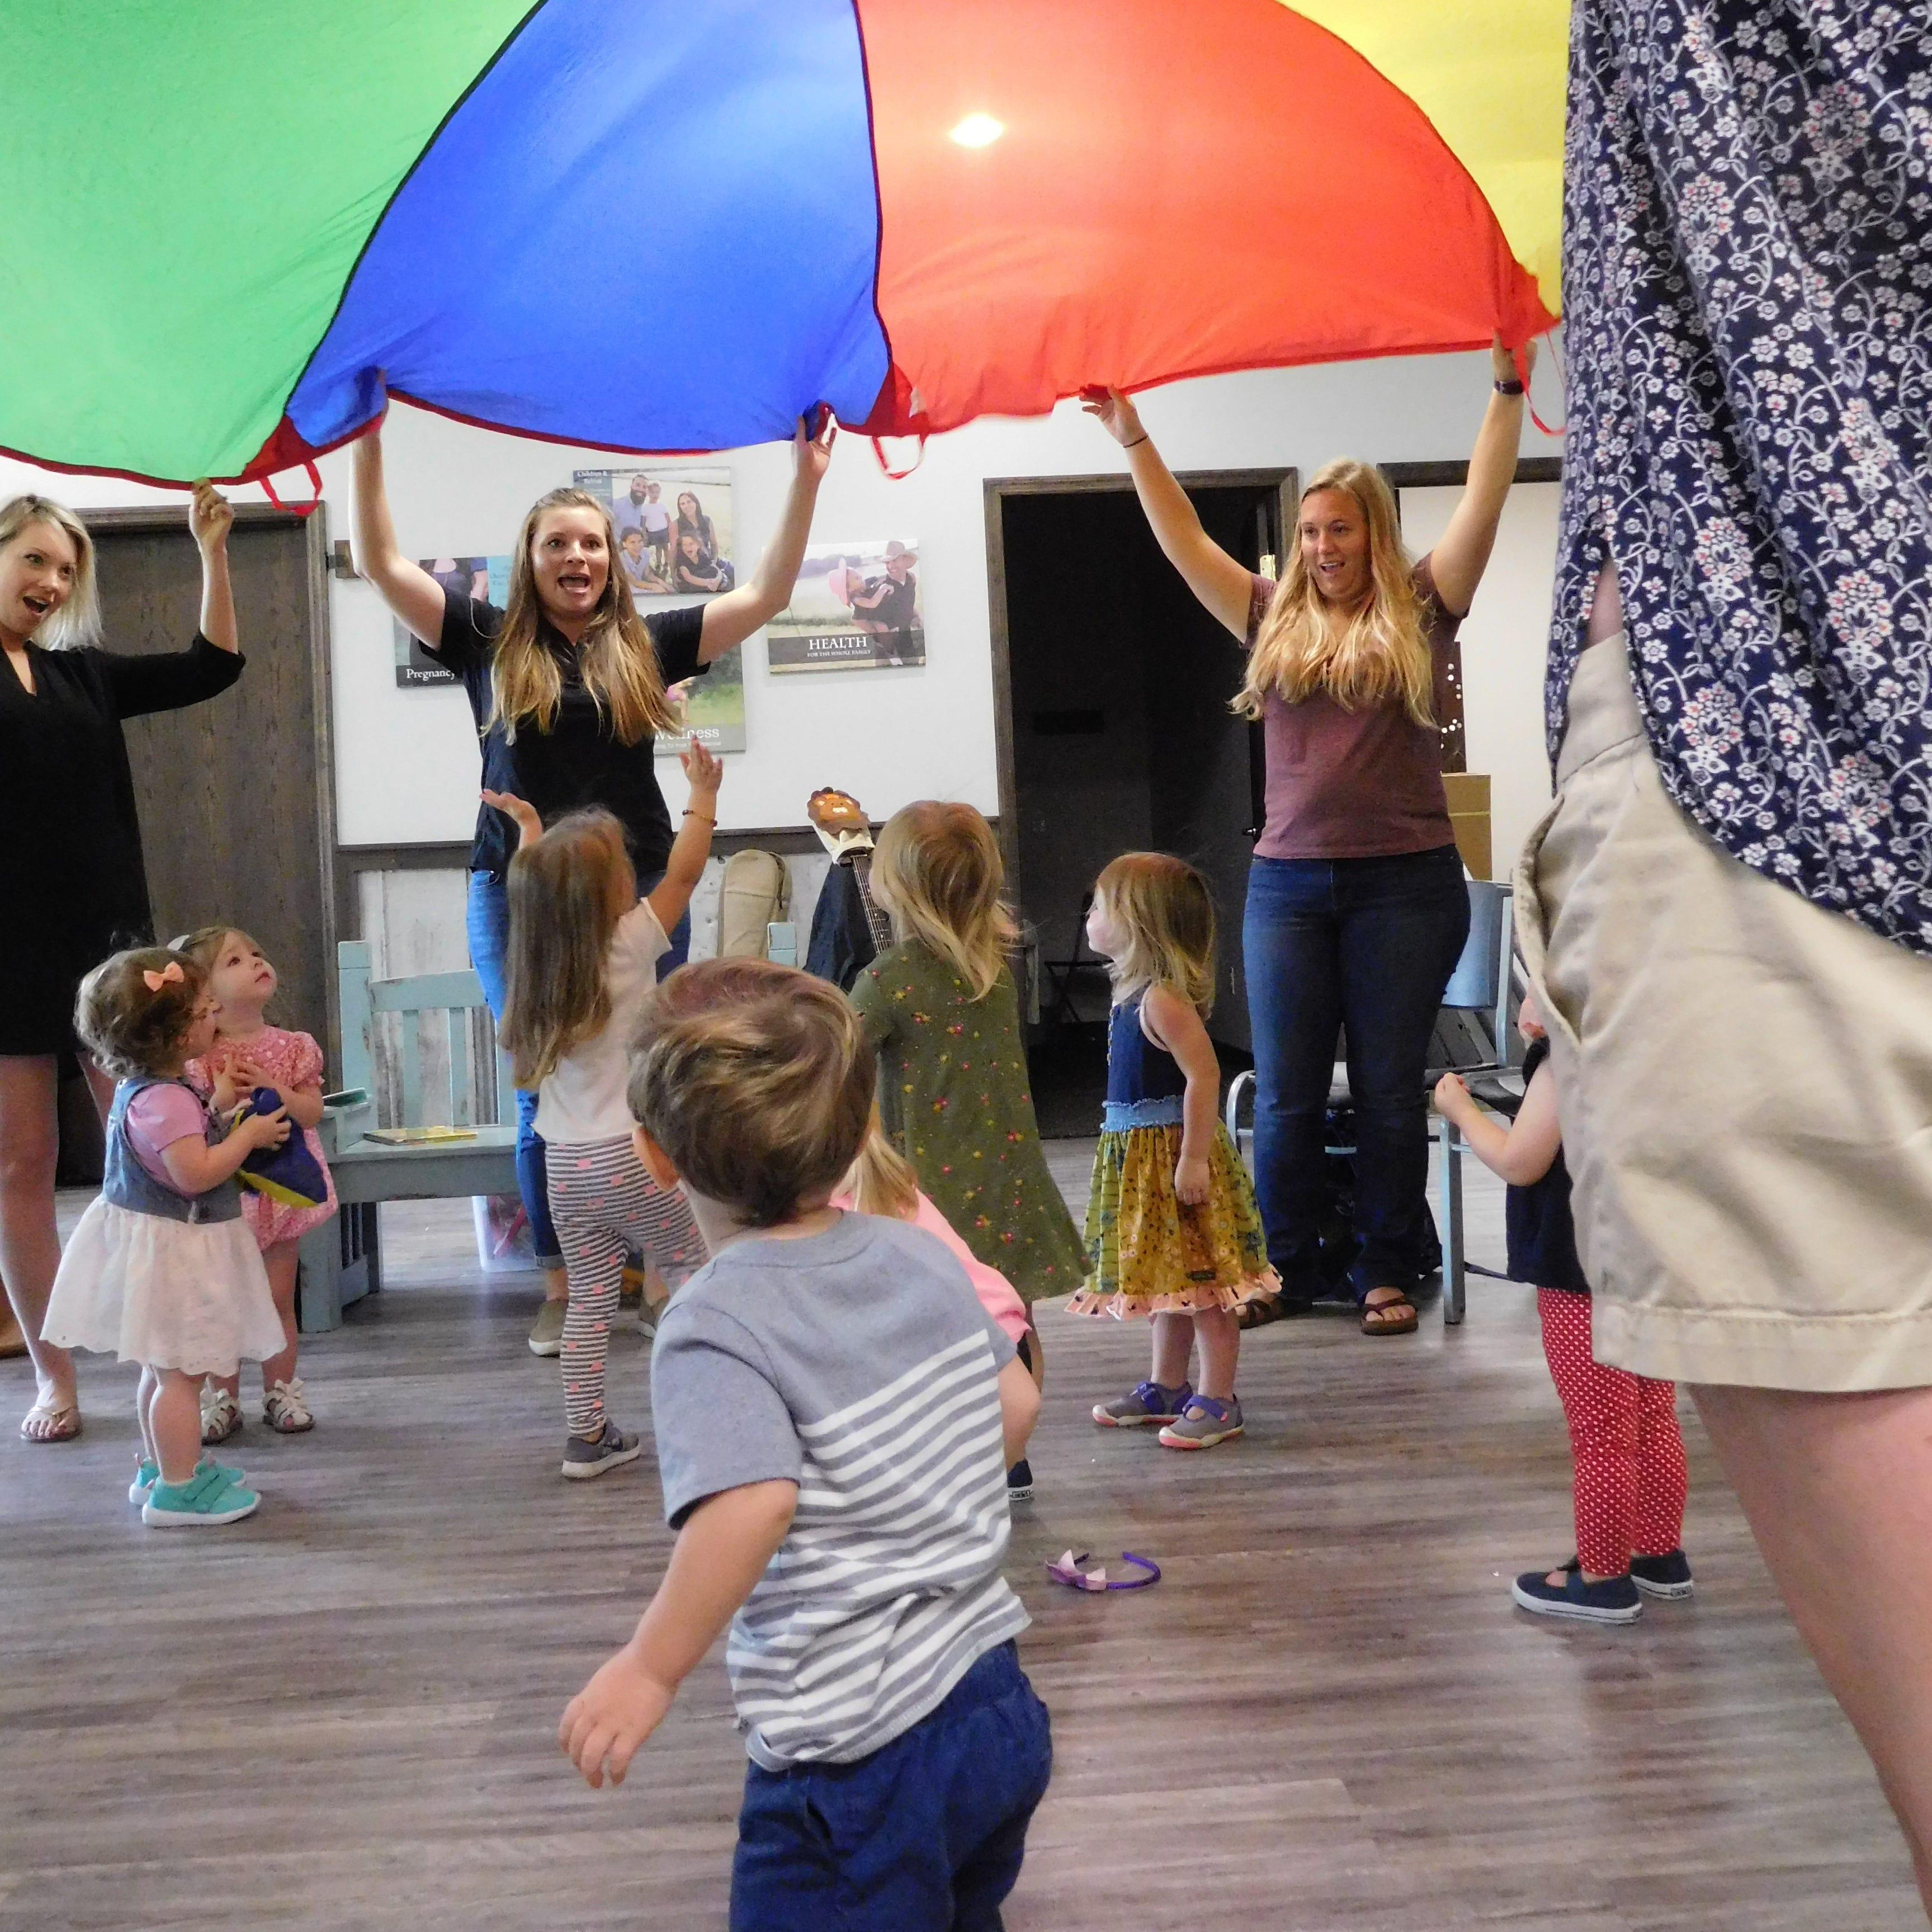 FSU research: Parental response plays role in friendship development